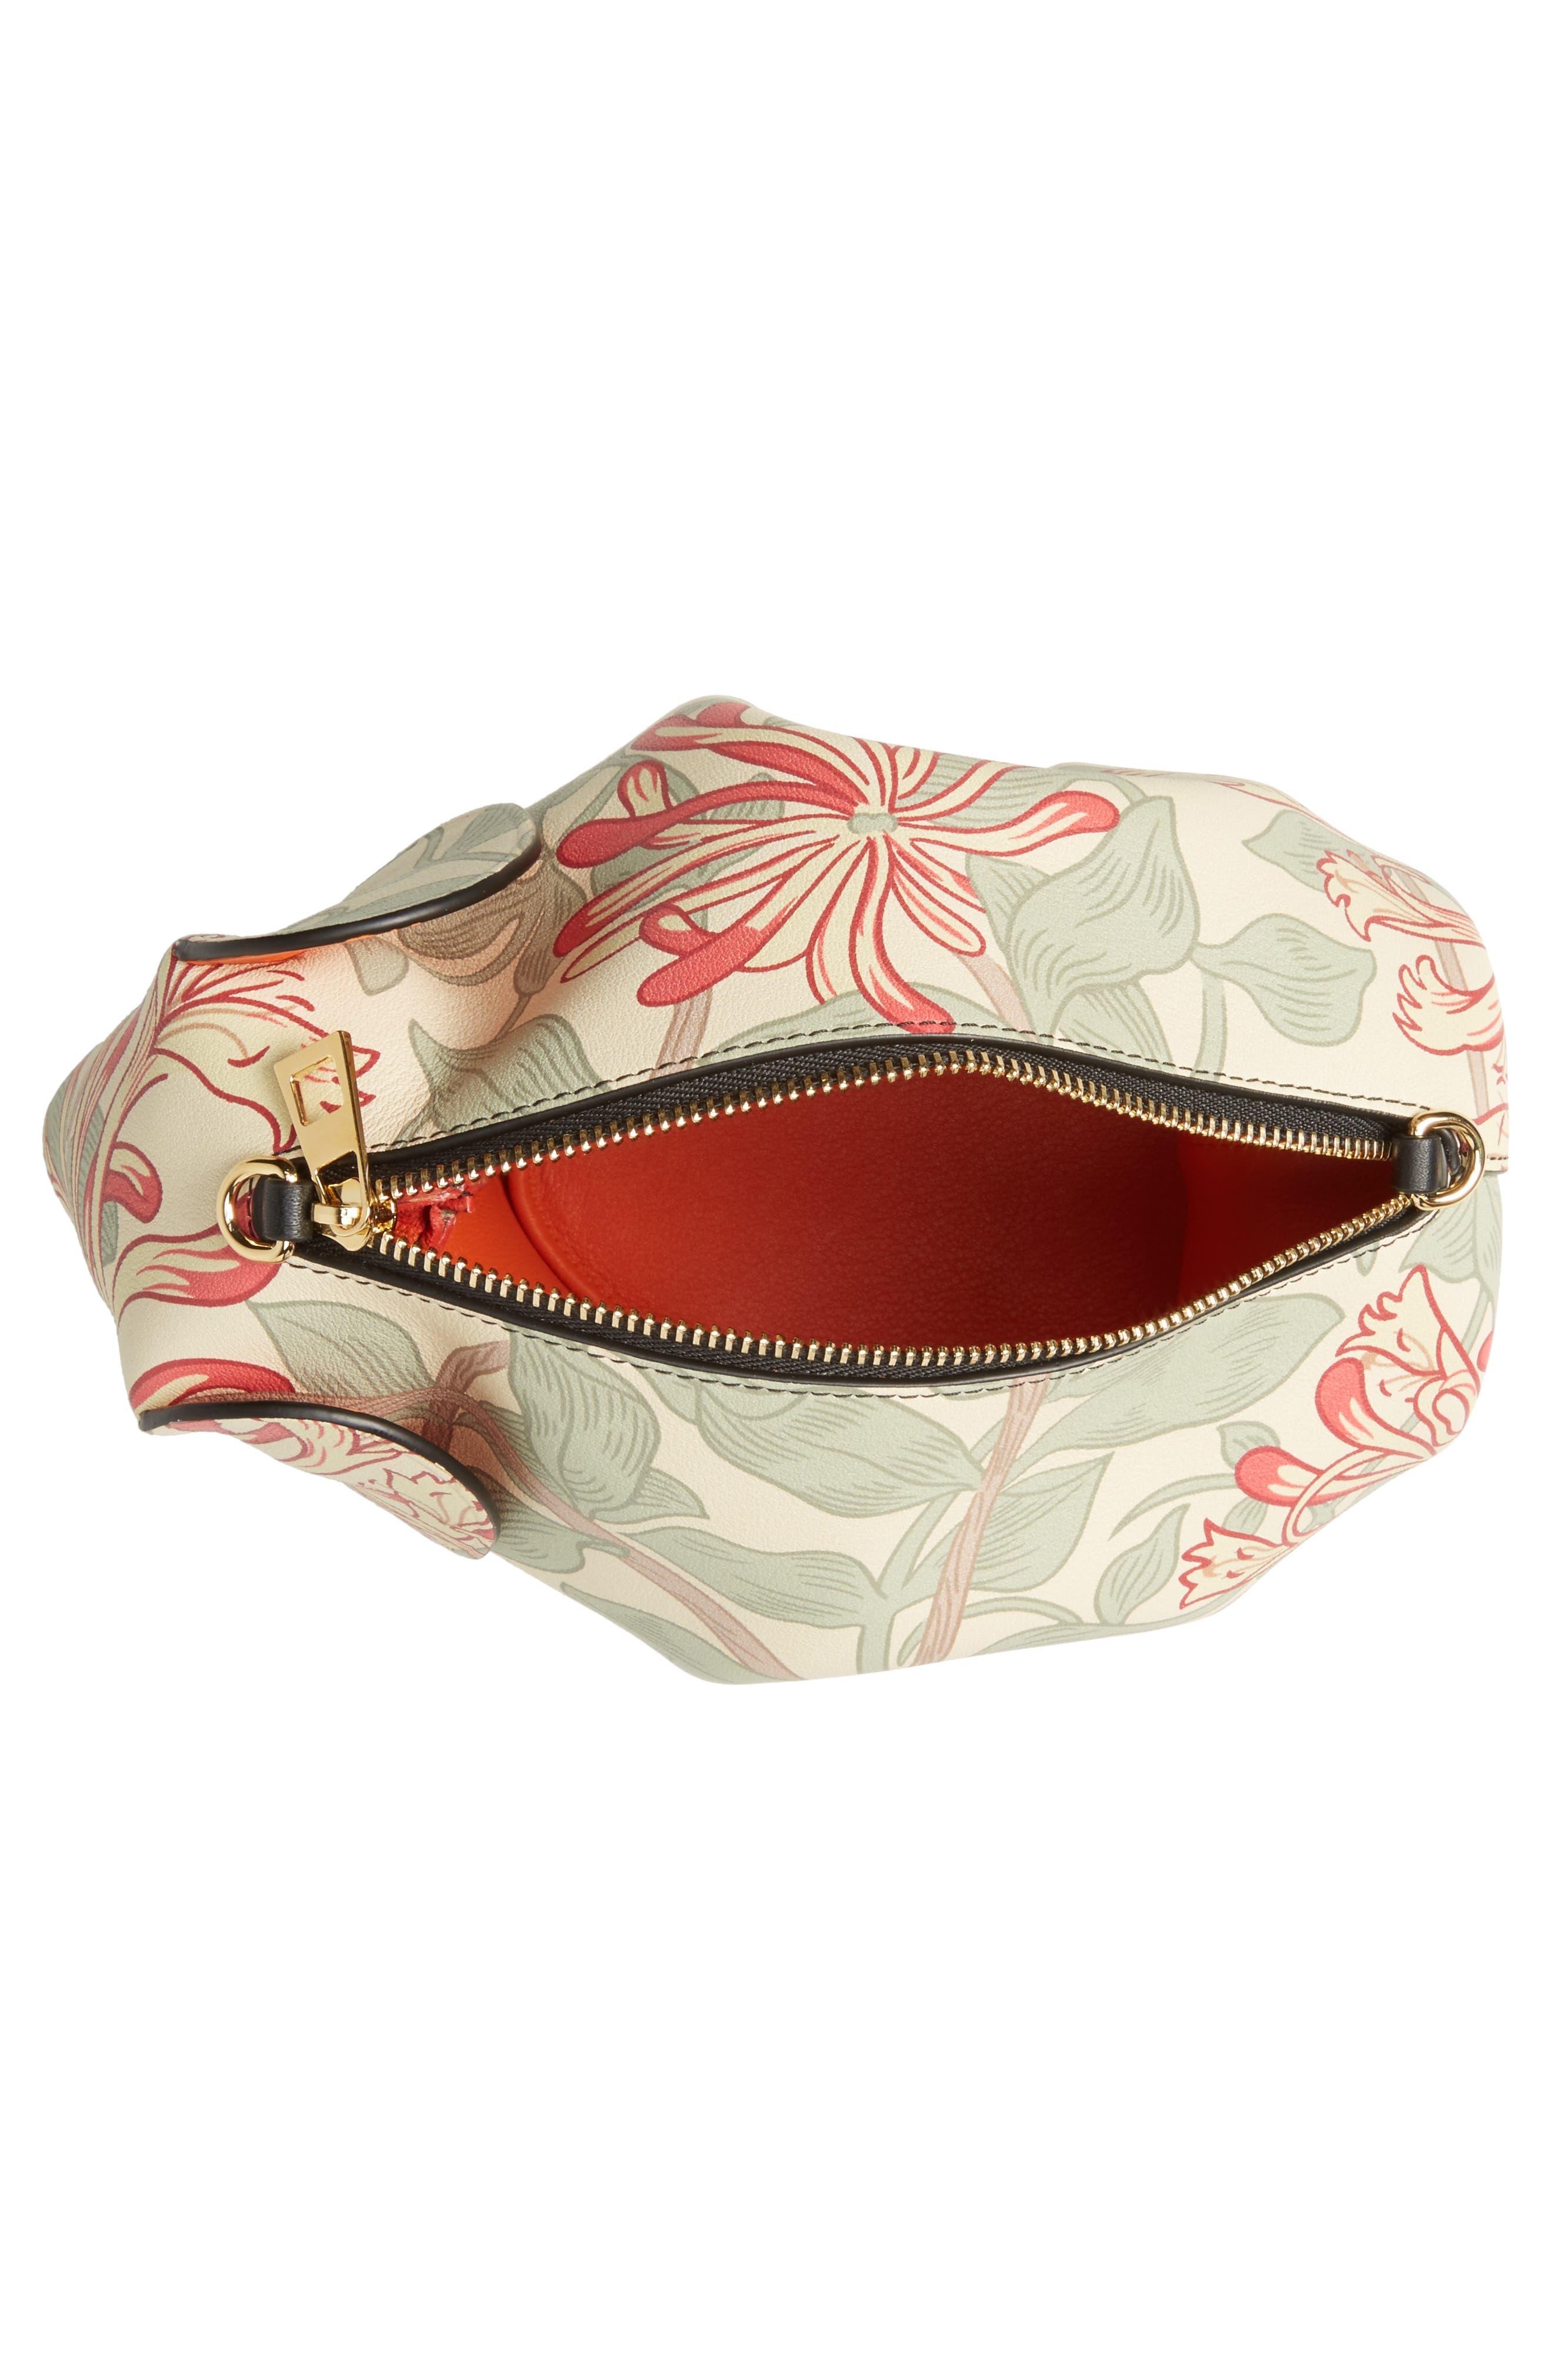 Mini Elephant Honeysuckle Print Leather Crossbody Bag,                             Alternate thumbnail 4, color,                             Beige/ Green/ Multicolour